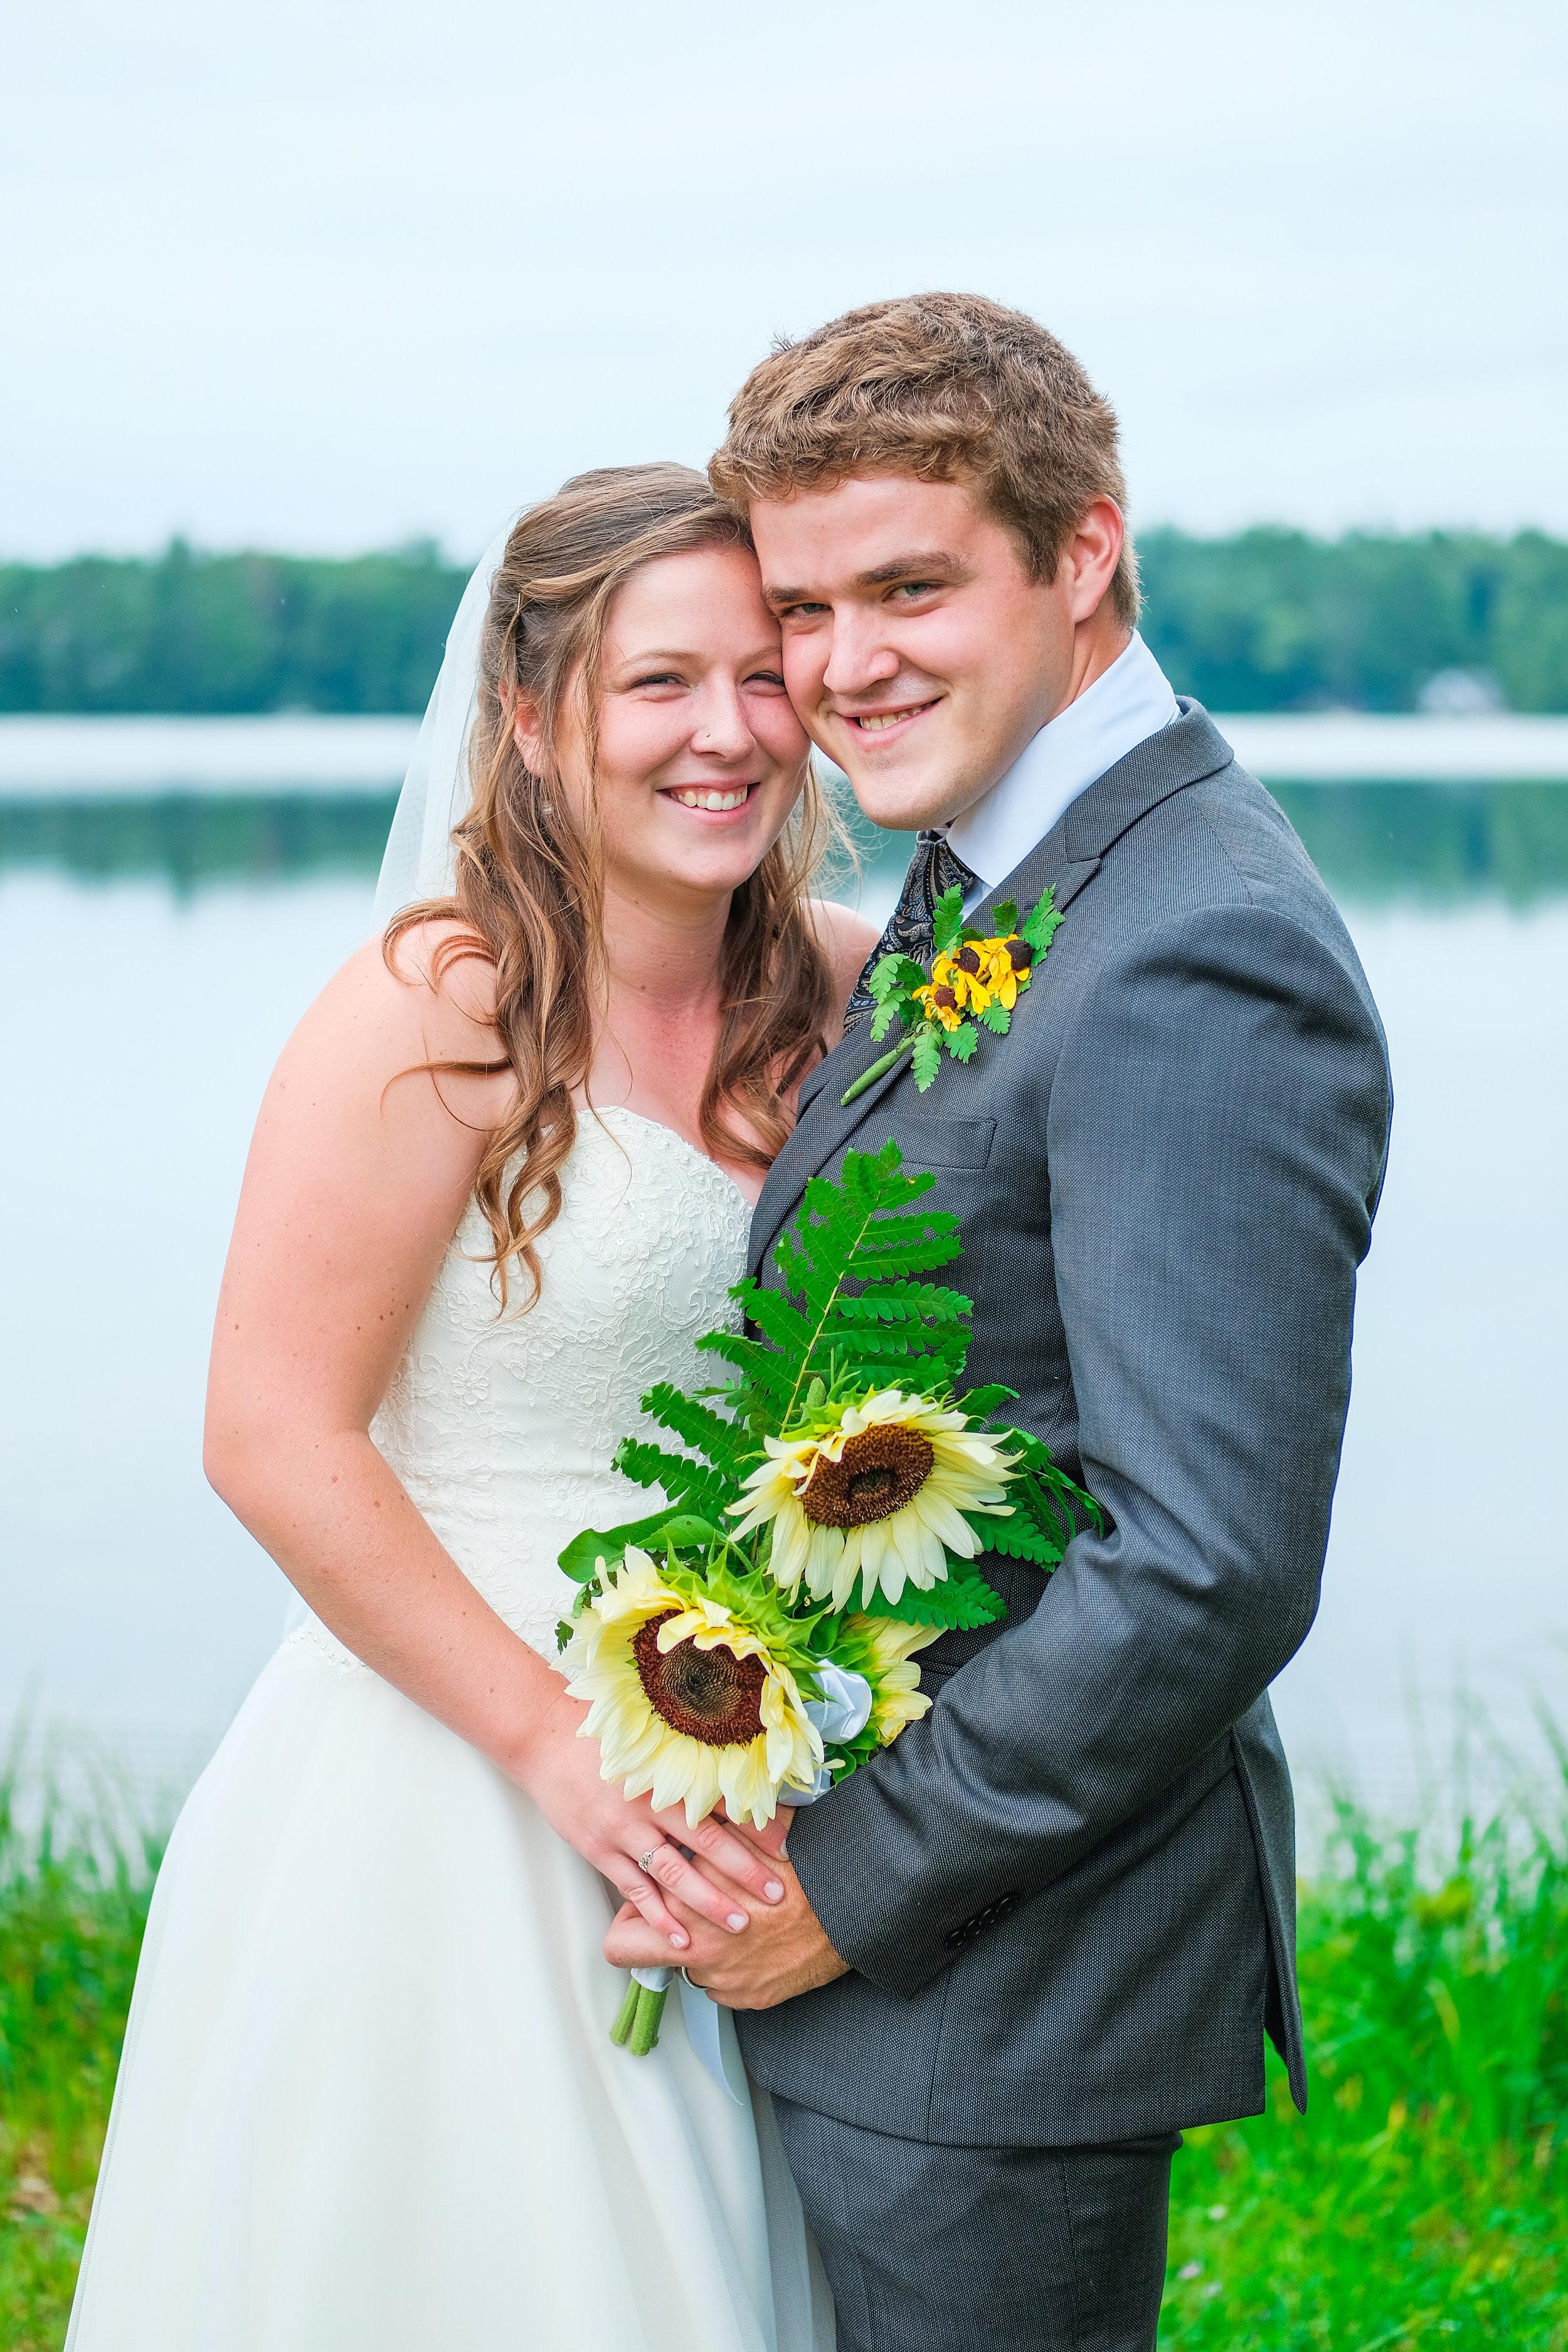 backyard-nh-wedding-photography-712.jpg